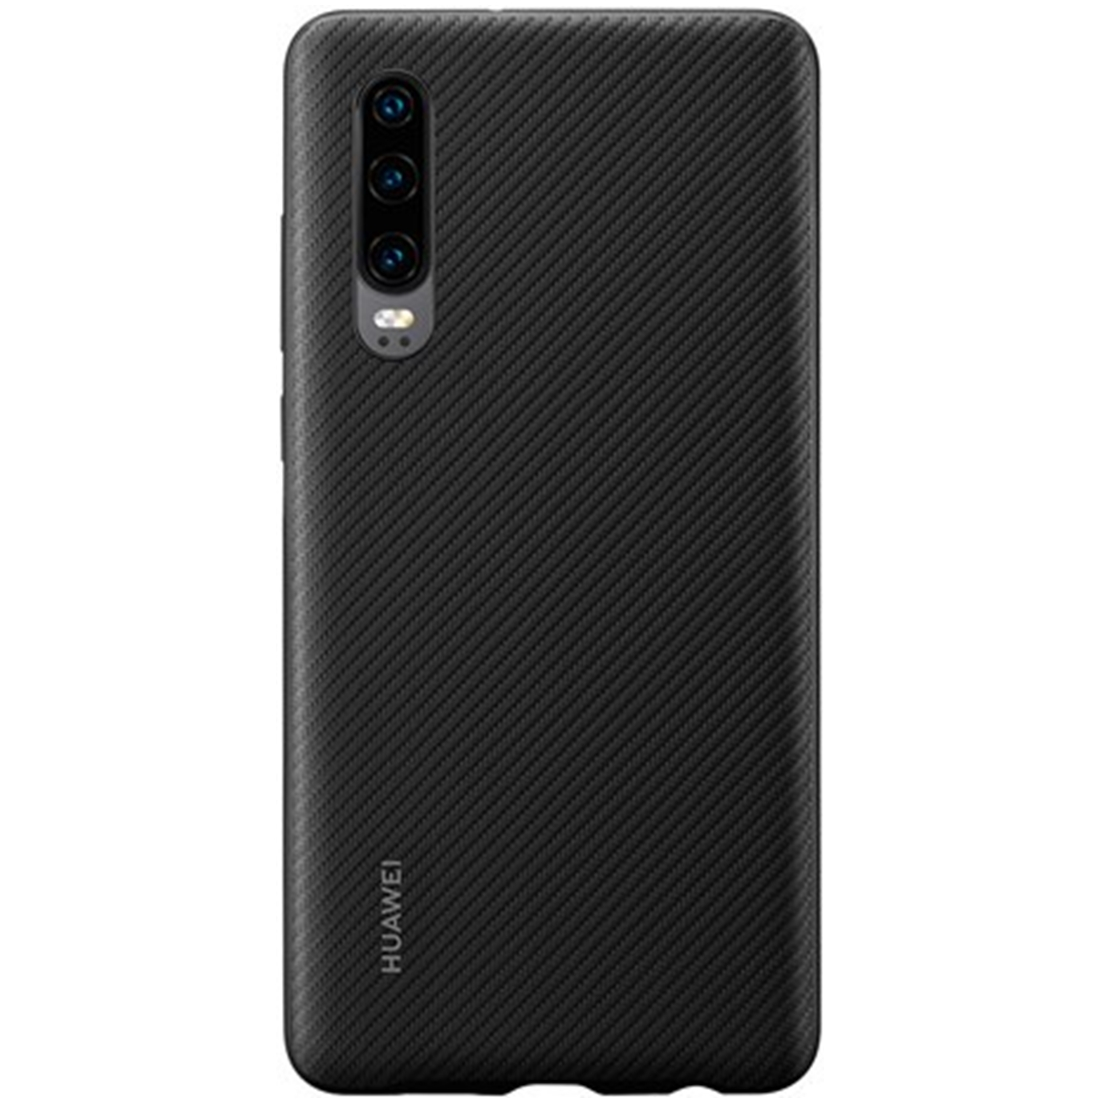 Capac protectie spate Huawei PU Cover pentru Huawei P30 Black